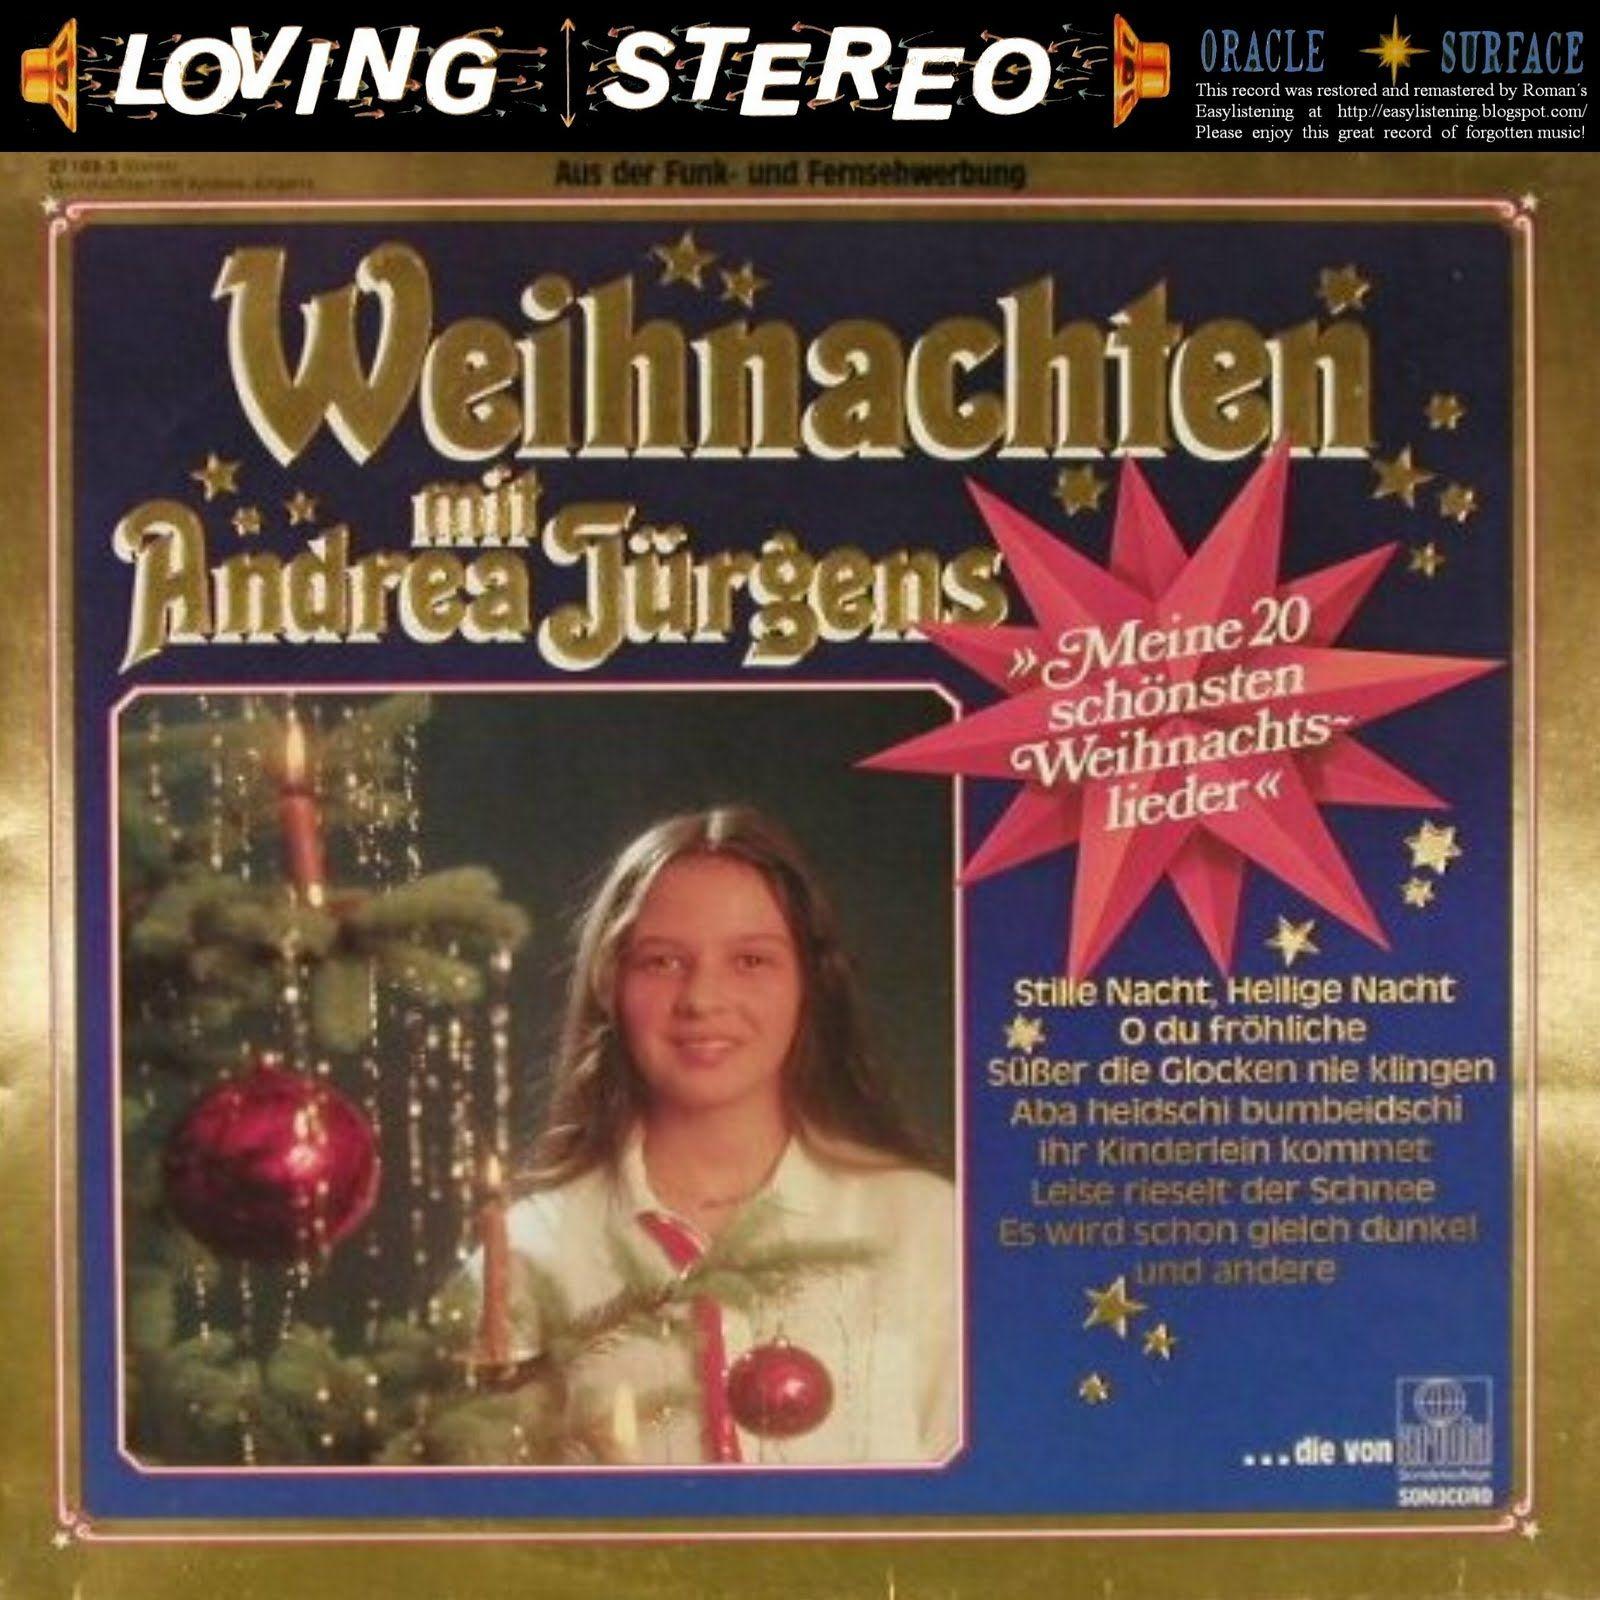 Weihnachten mit Andrea Jürgens/German Christmas songs